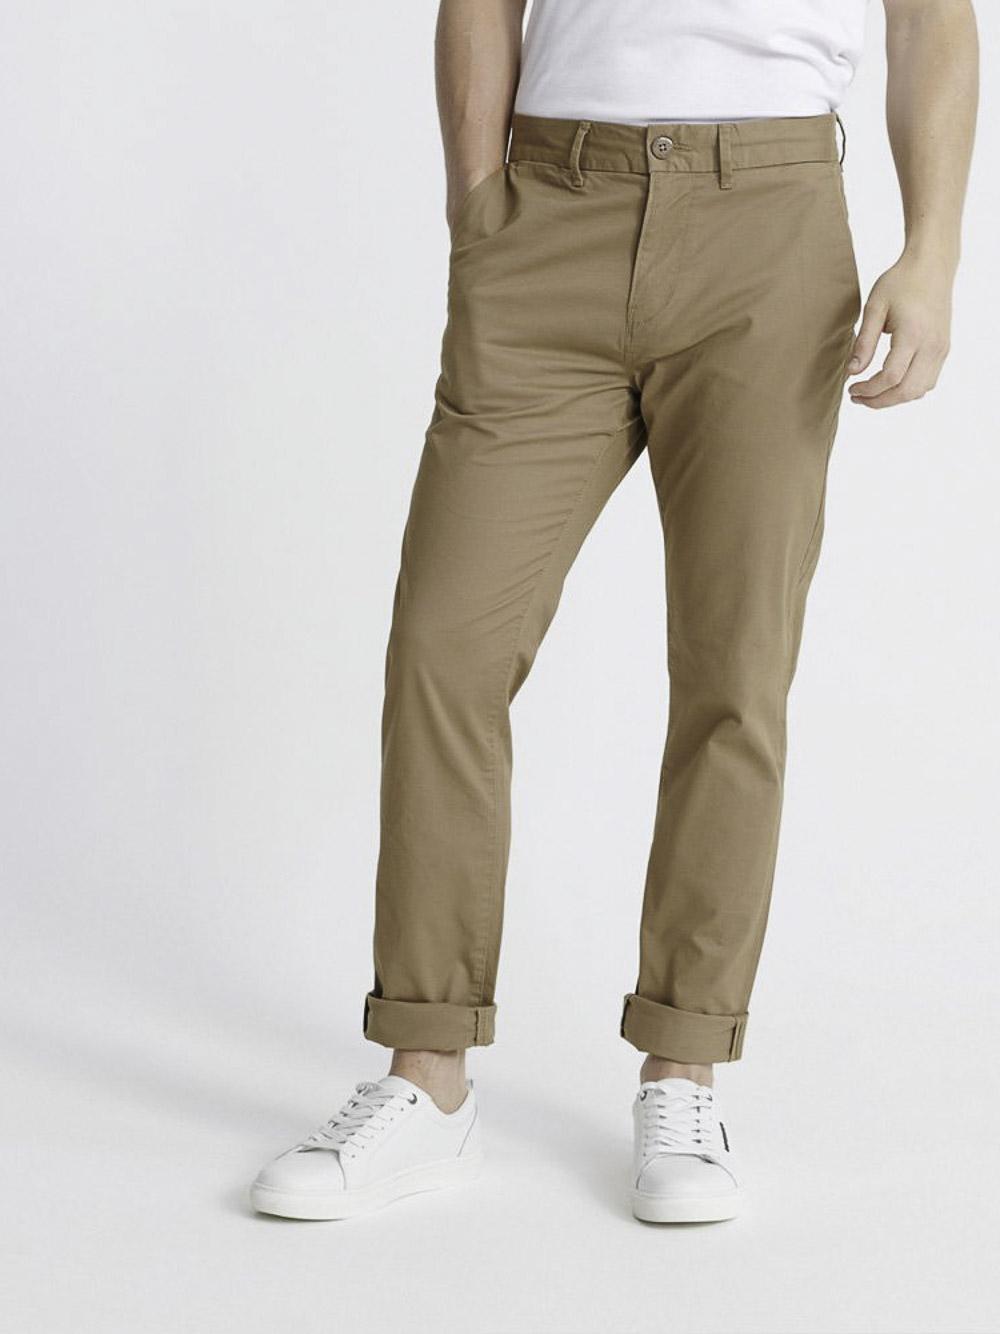 SUPERDRY Παντελόνι chinos M7010463A-GVK ΧΑΚΙ ΠΛΥΜΕΝΟ